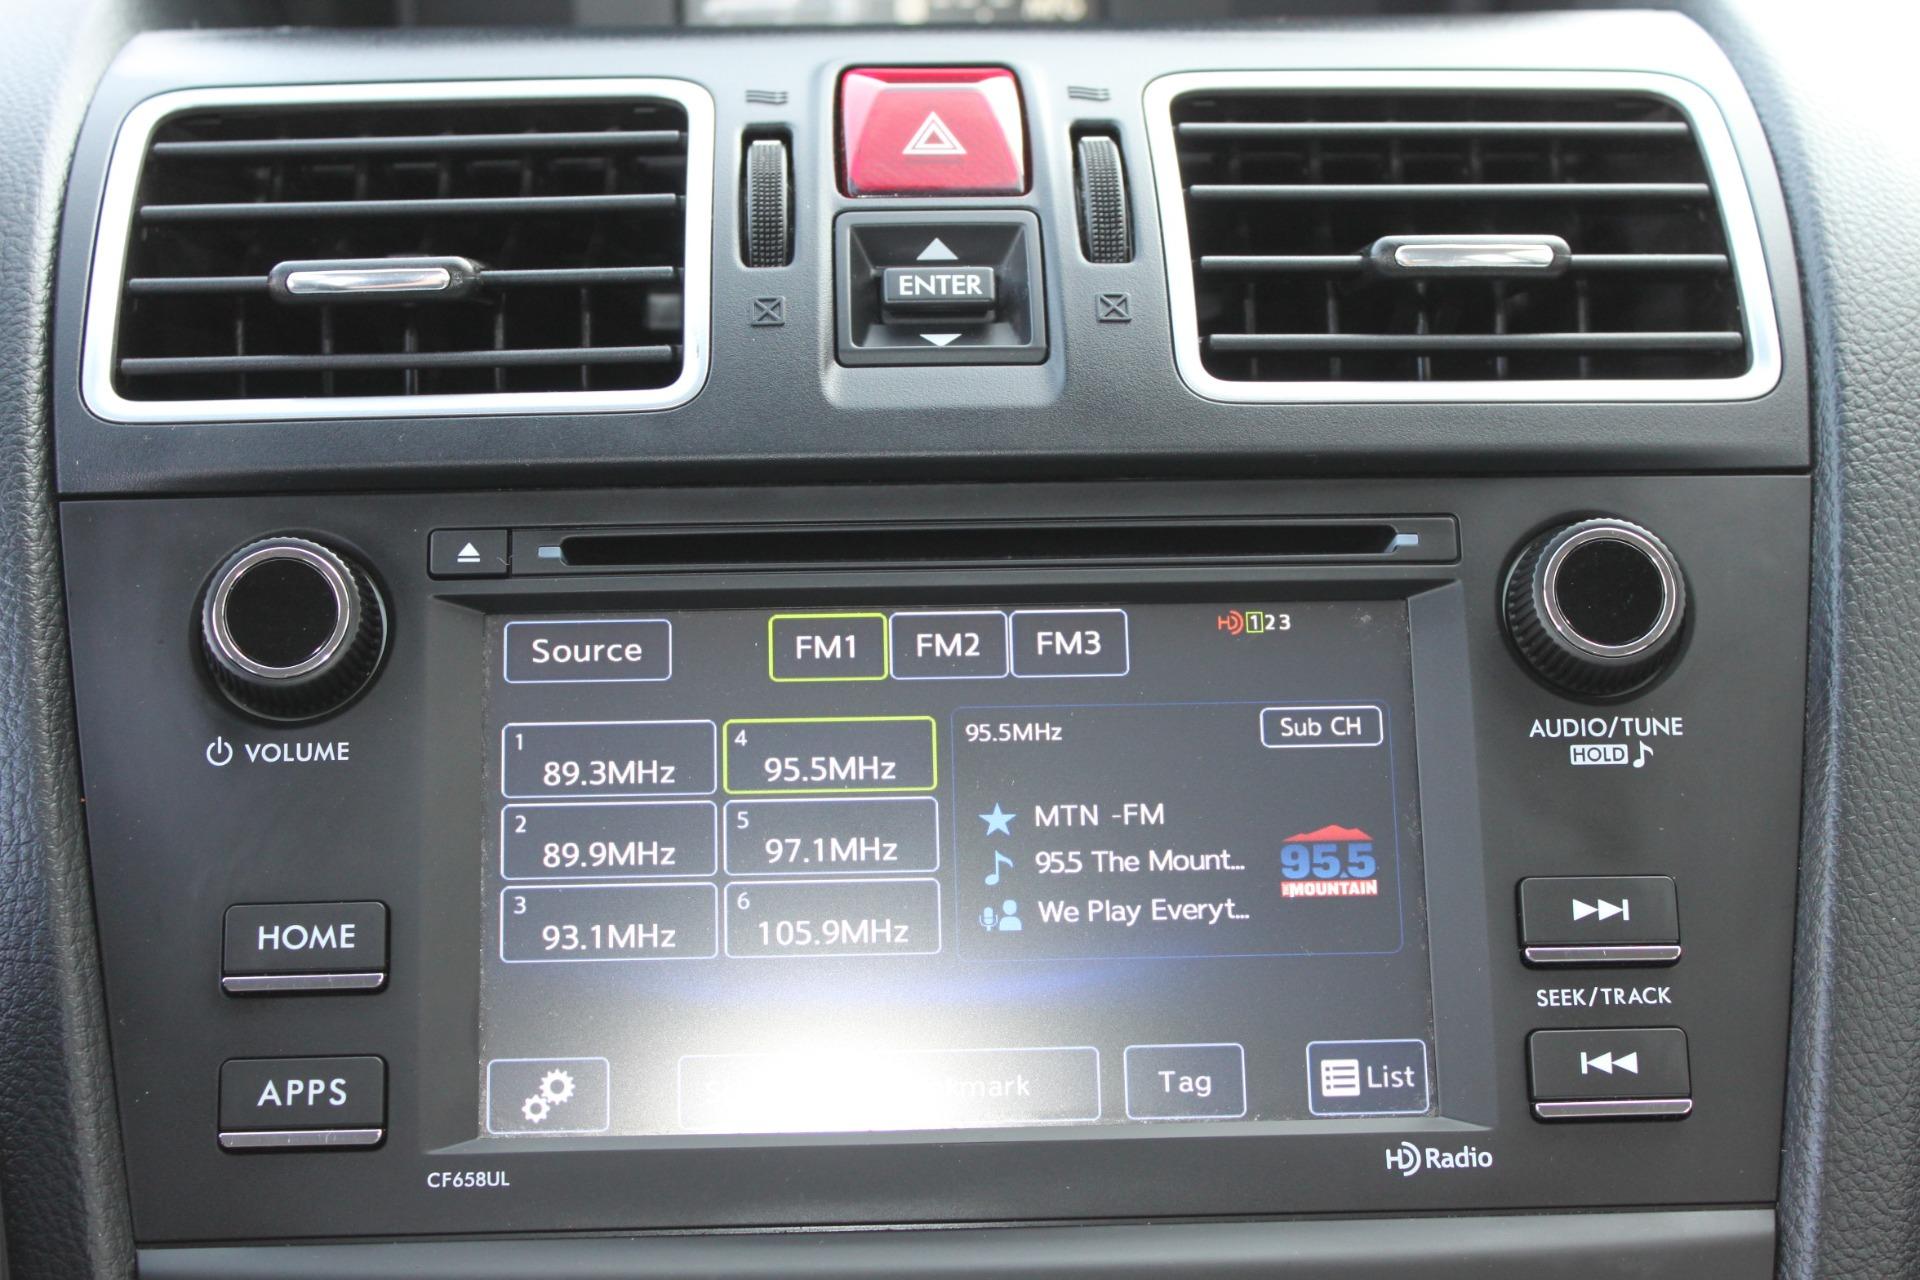 Used-2017-Subaru-Forester-25i-All-Wheel-Drive-25i-Mopar